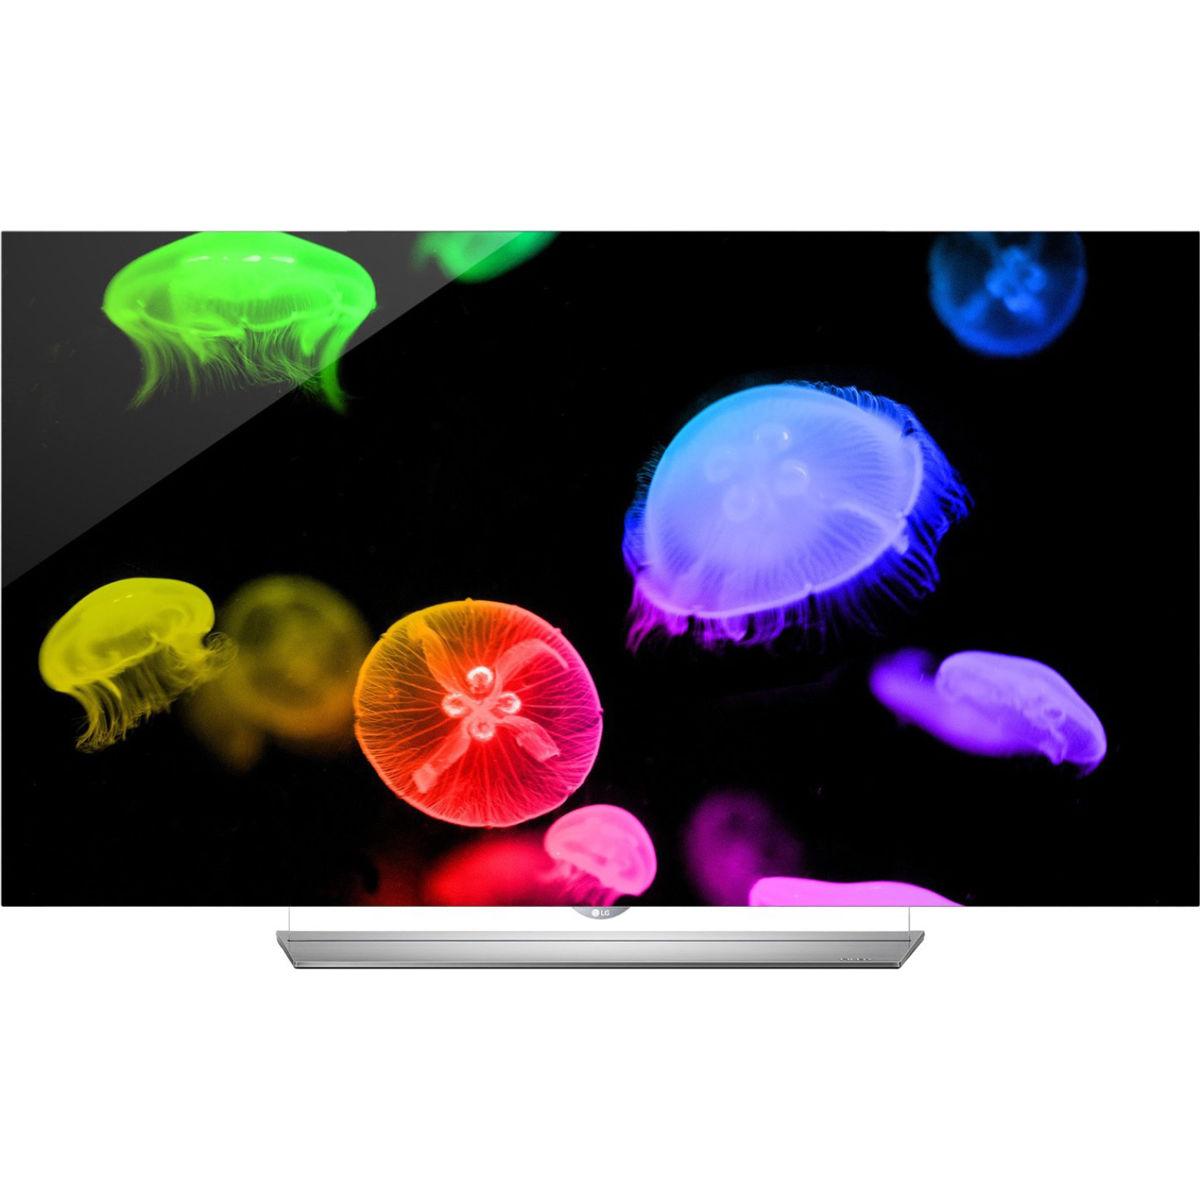 "65"" LG 65EF9500 4K Smart 3D OLED HDTV $2999 + Free Shipping"